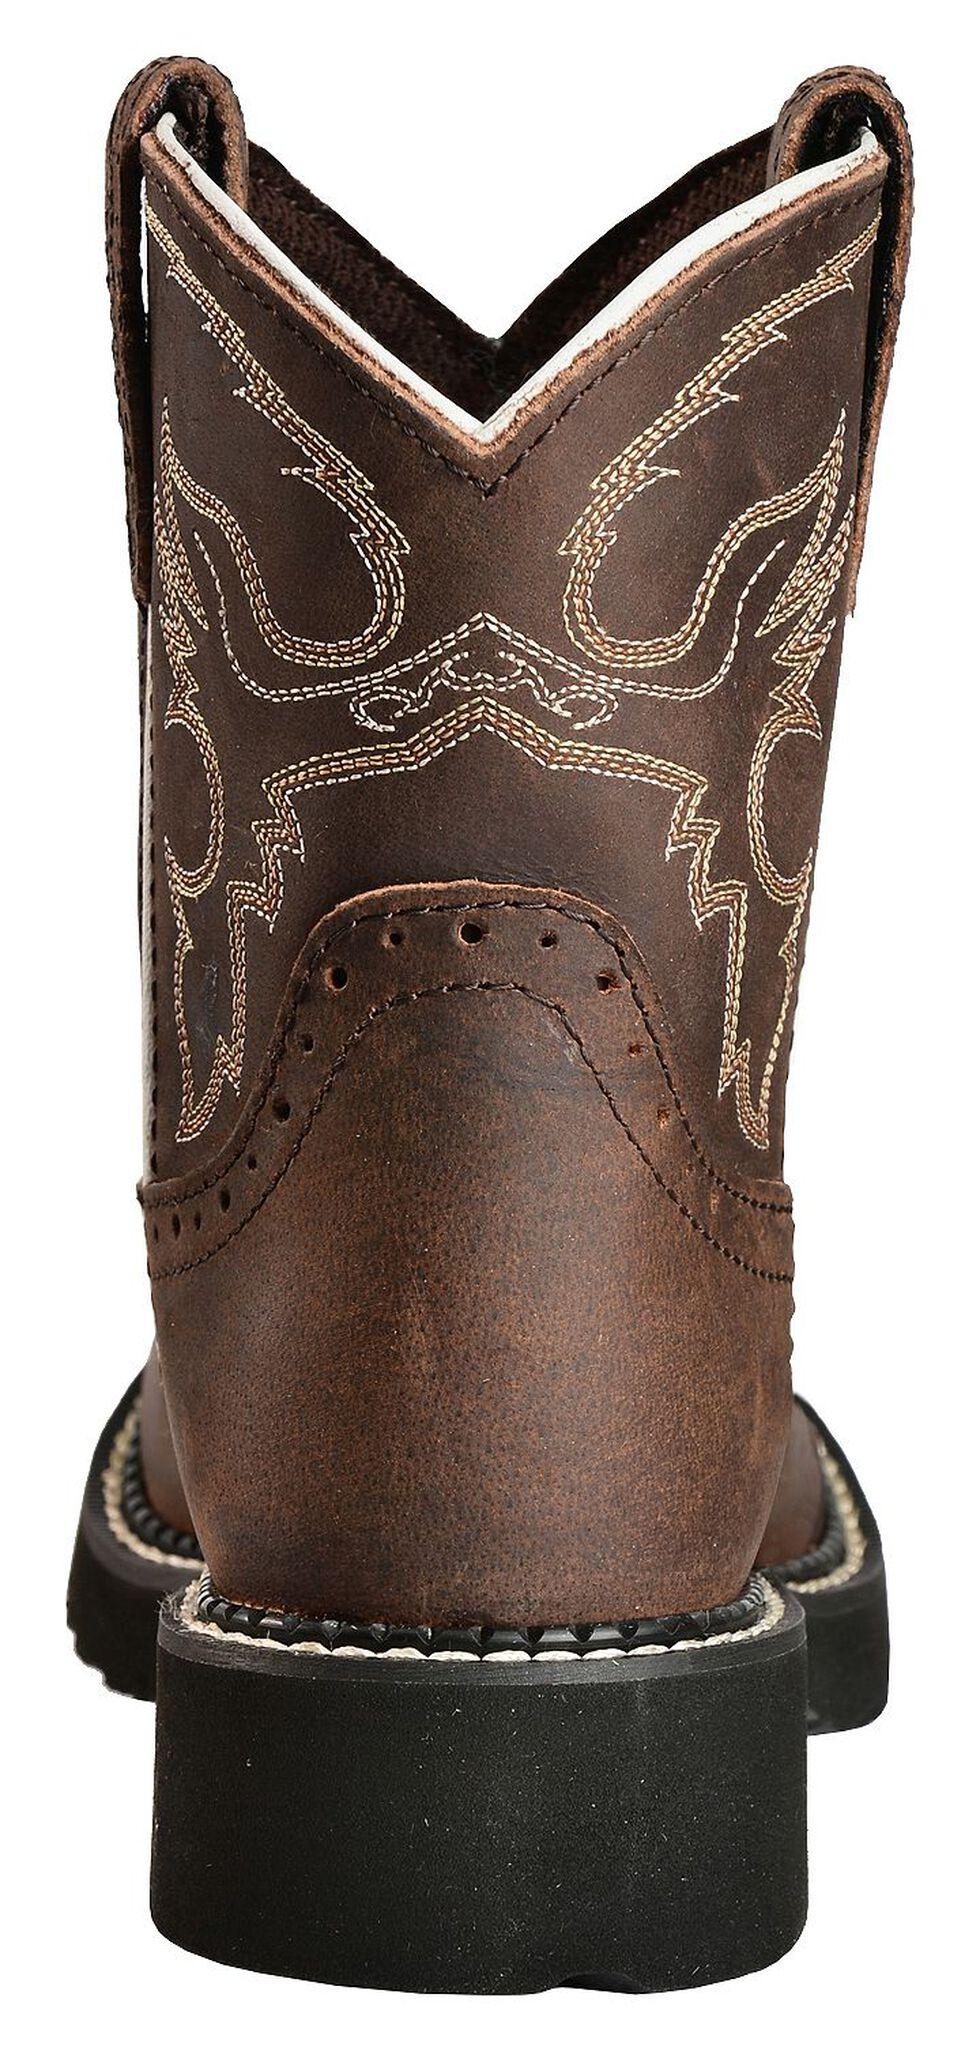 Justin Youth Girls' Aged Bark Gypsy Cowboy Boots, Aged Bark, hi-res